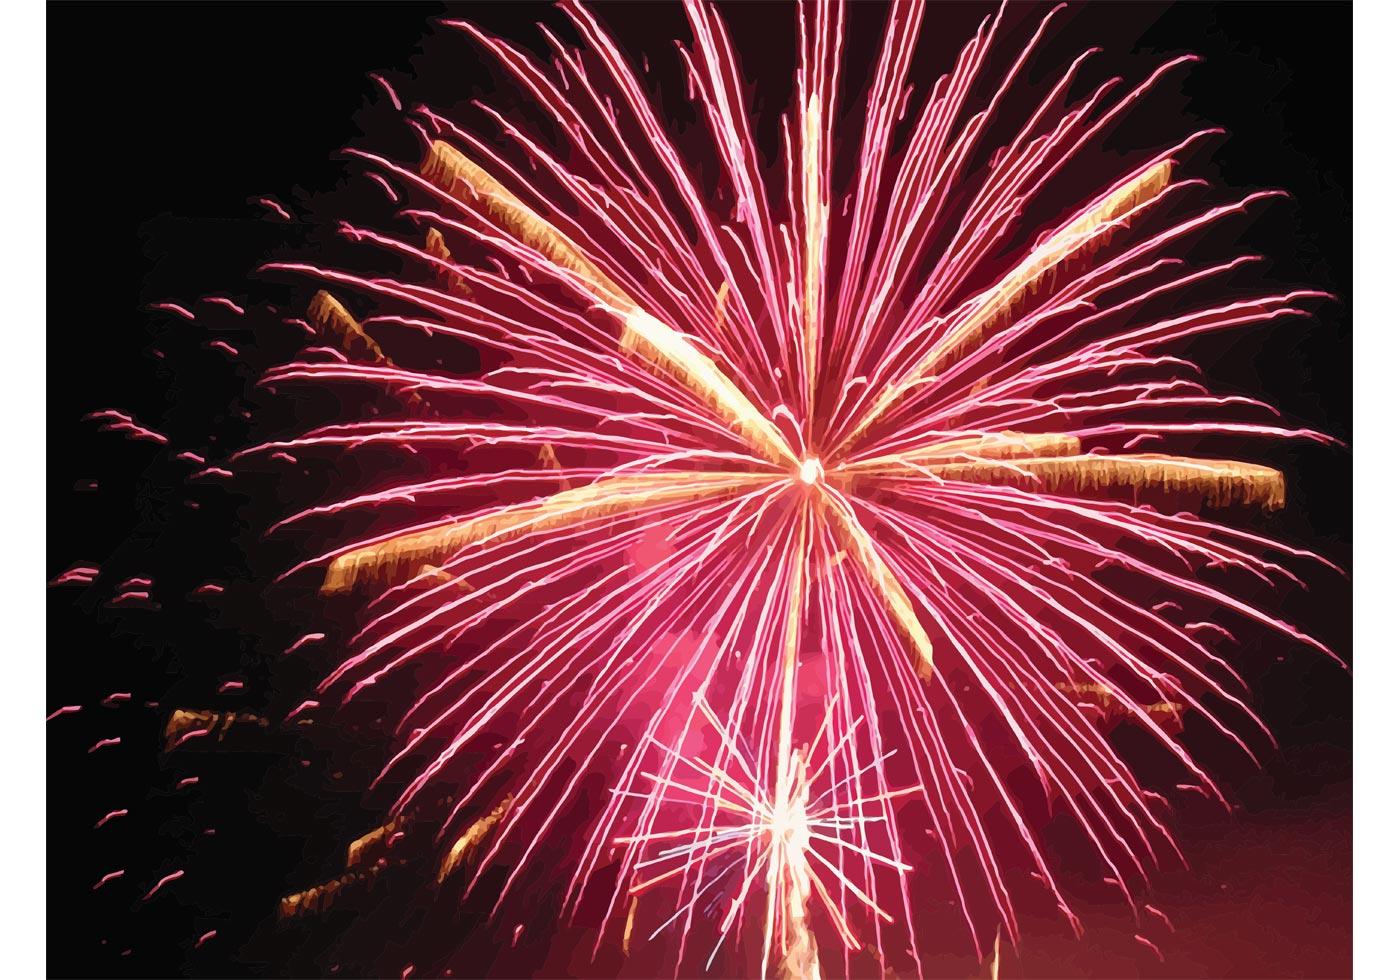 Fireworks Background Free Vector Art - (43041 Free Downloads)